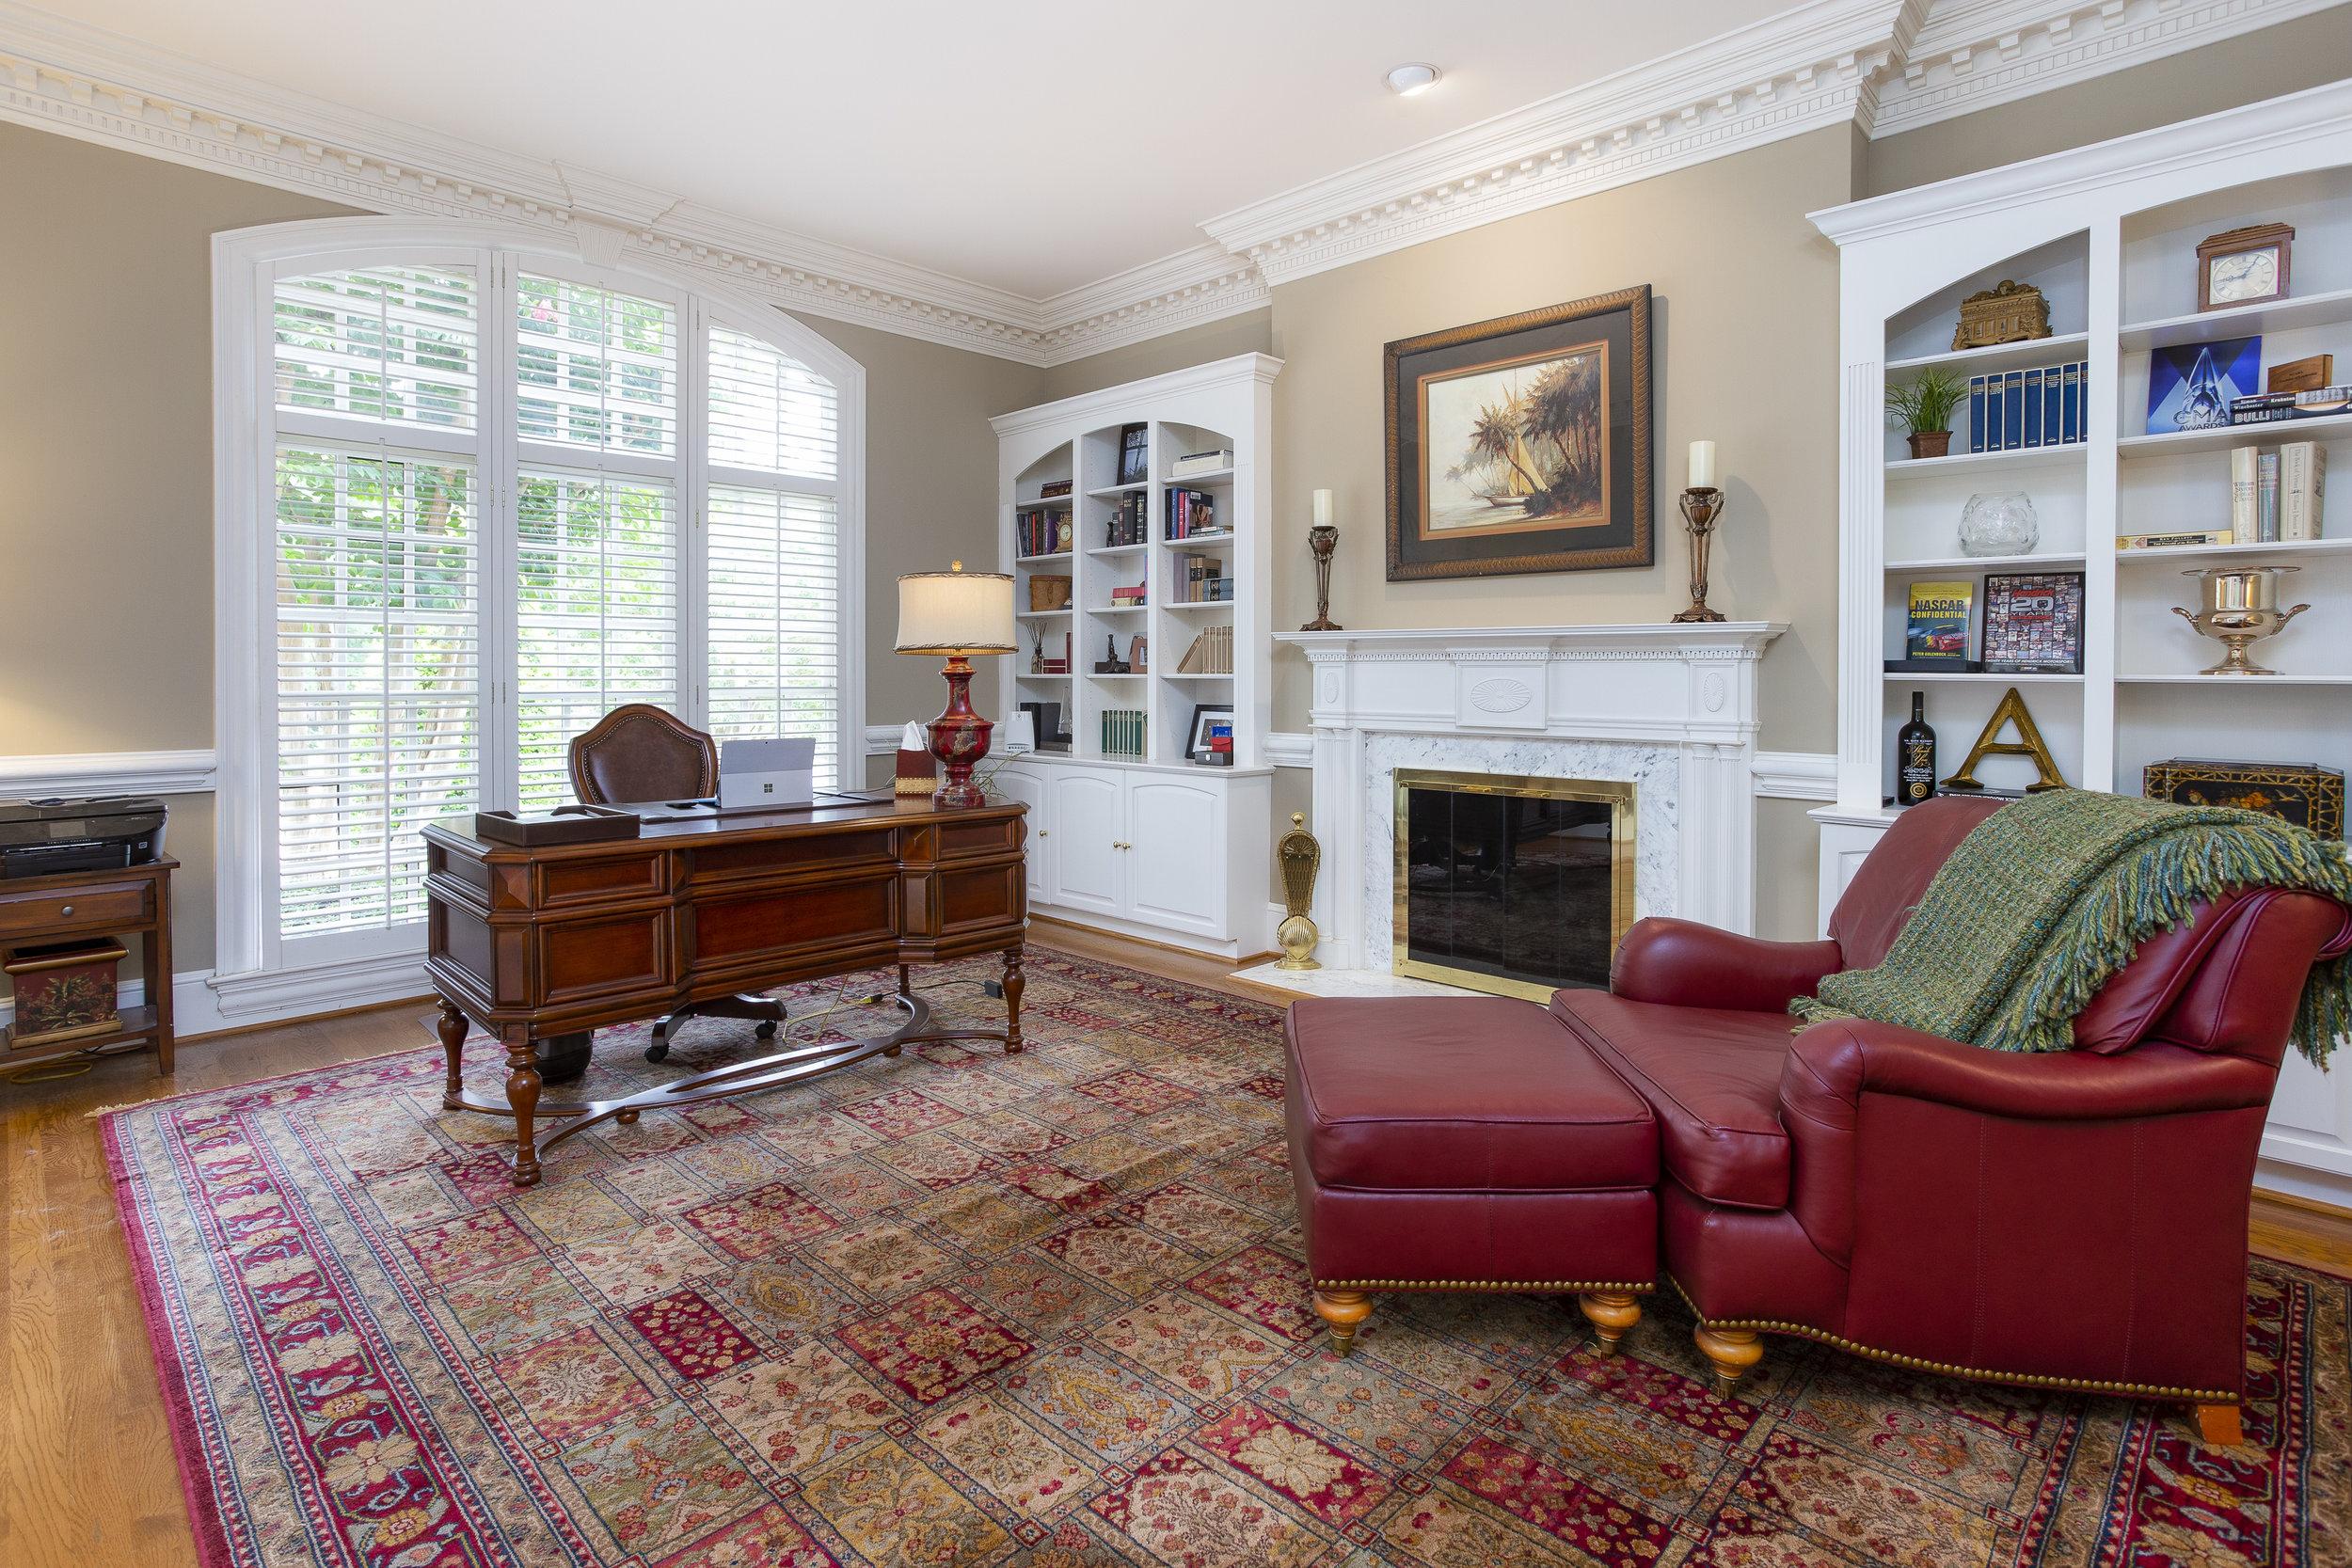 triad-real-estate-photography-drone-aerial-photographer-realtor-high-point-greensboro-kernersville-burlington03.jpg